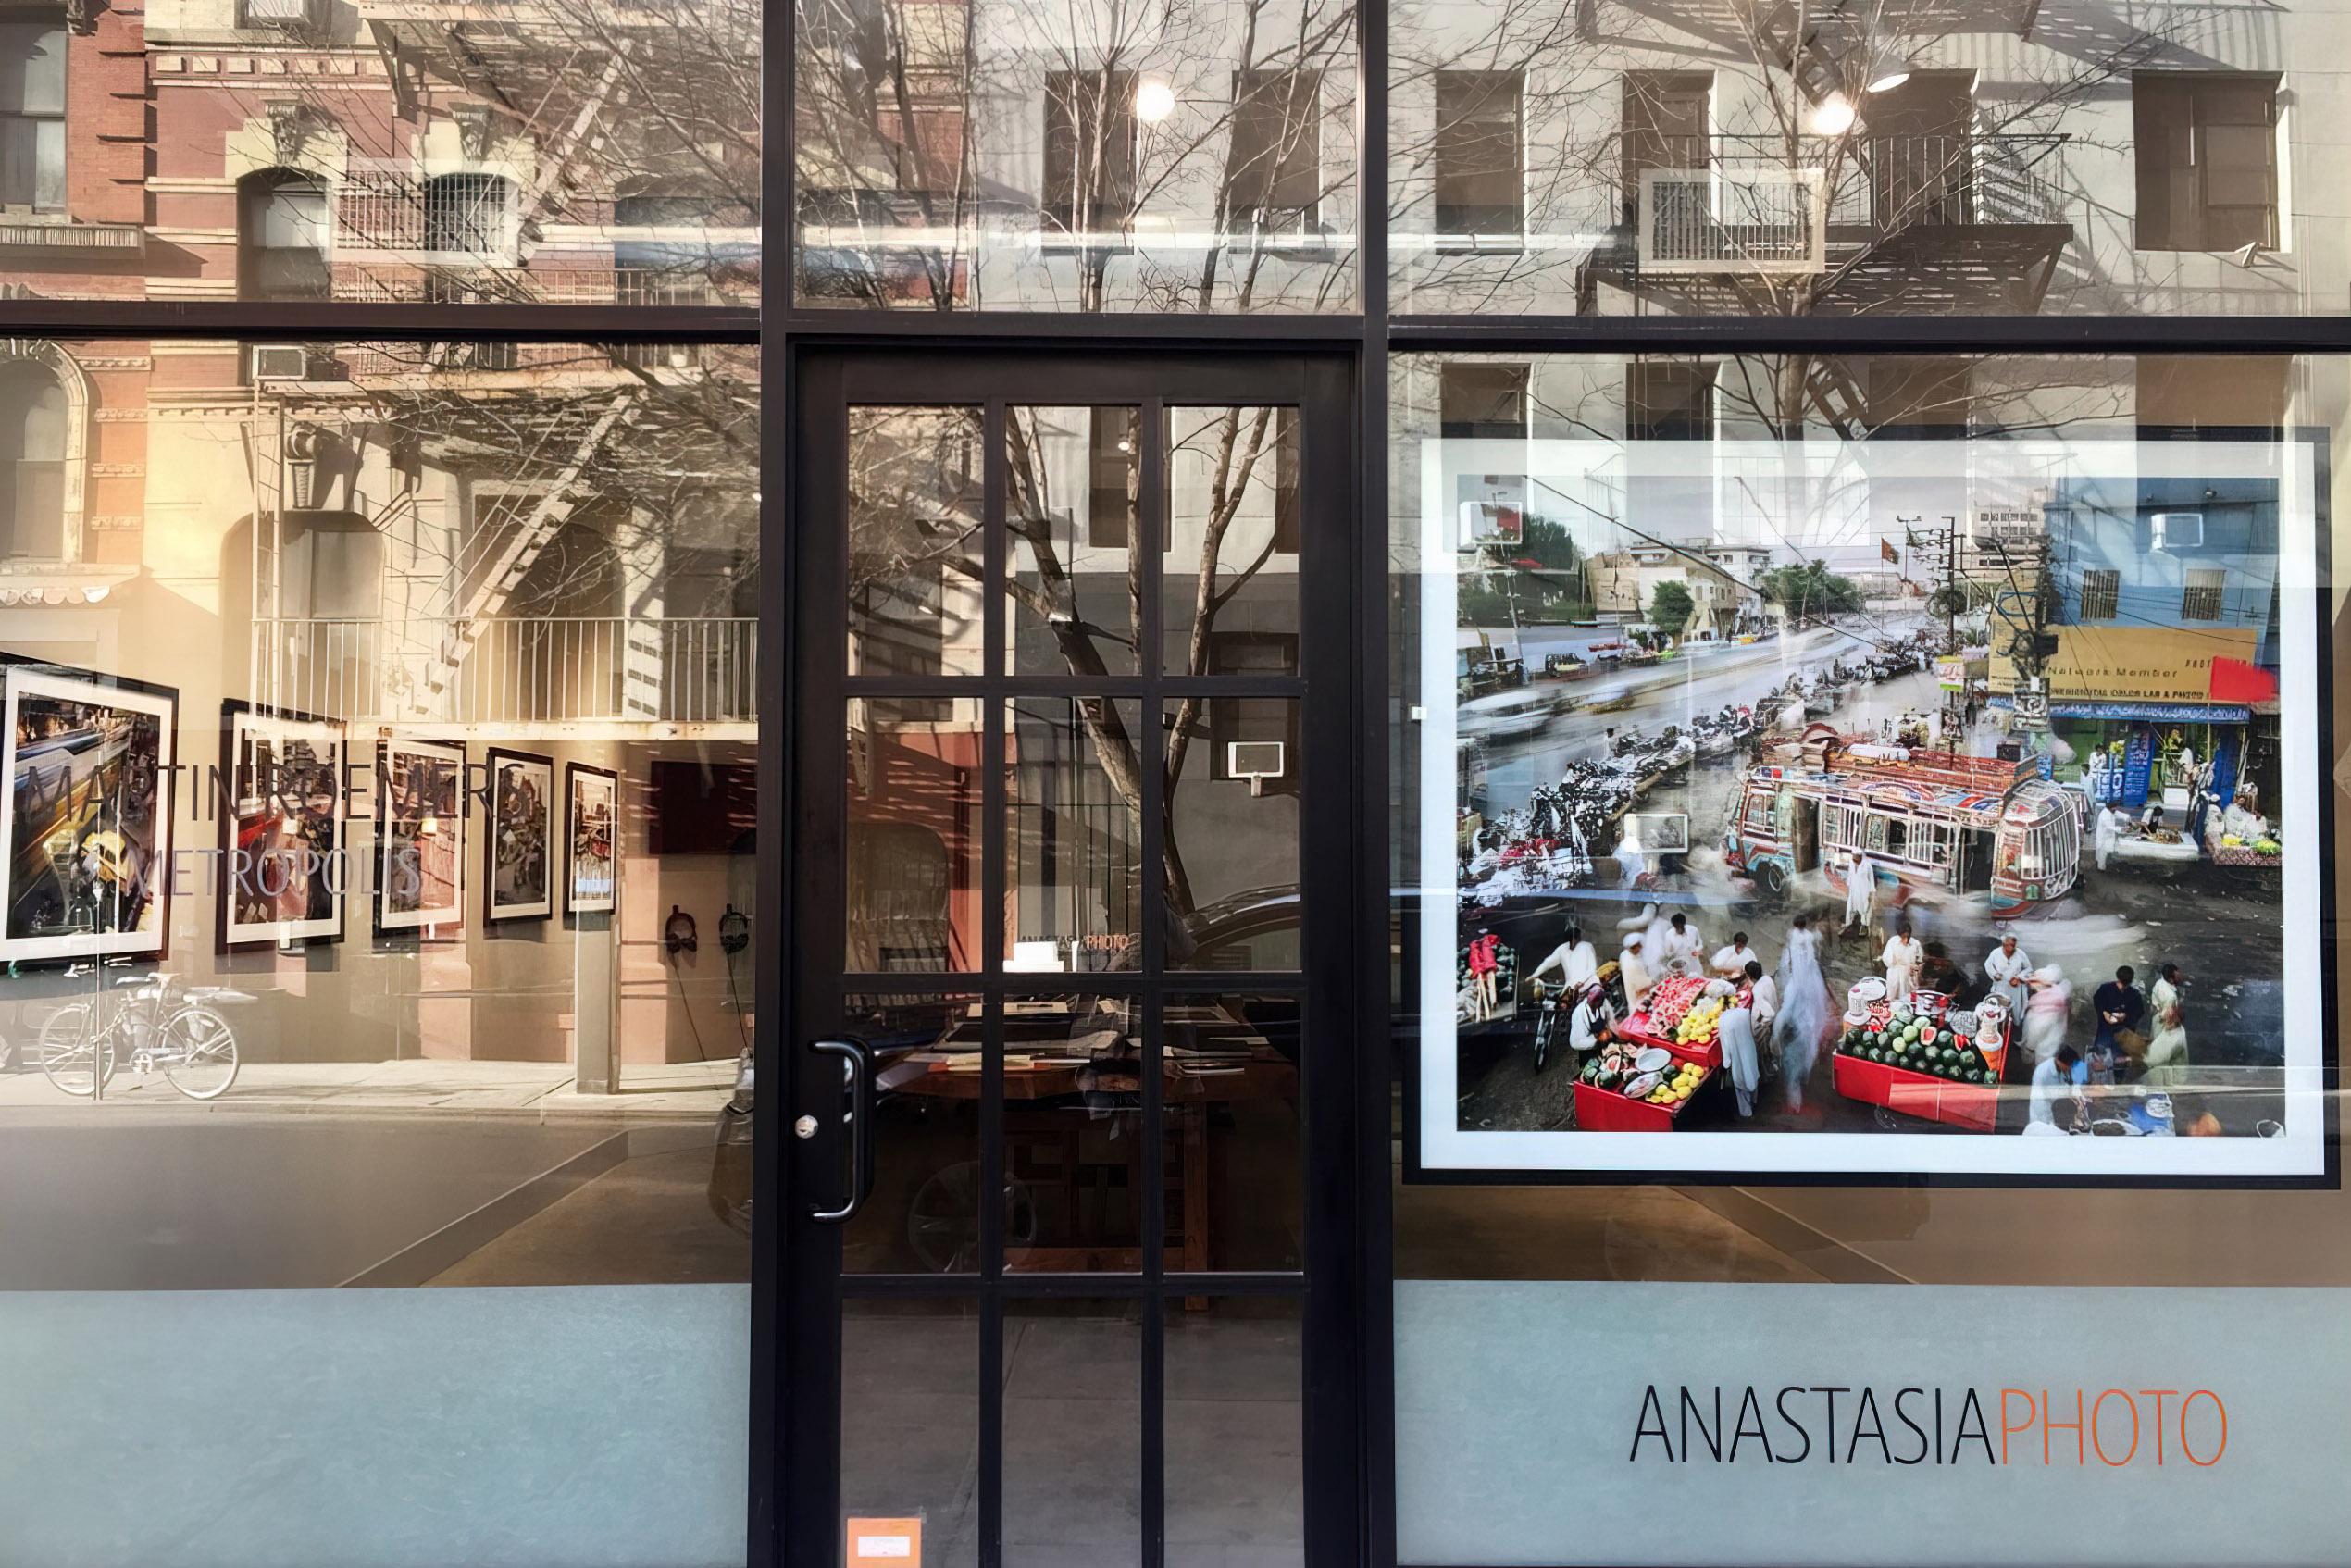 Anastasia Photo Gallery, New York City